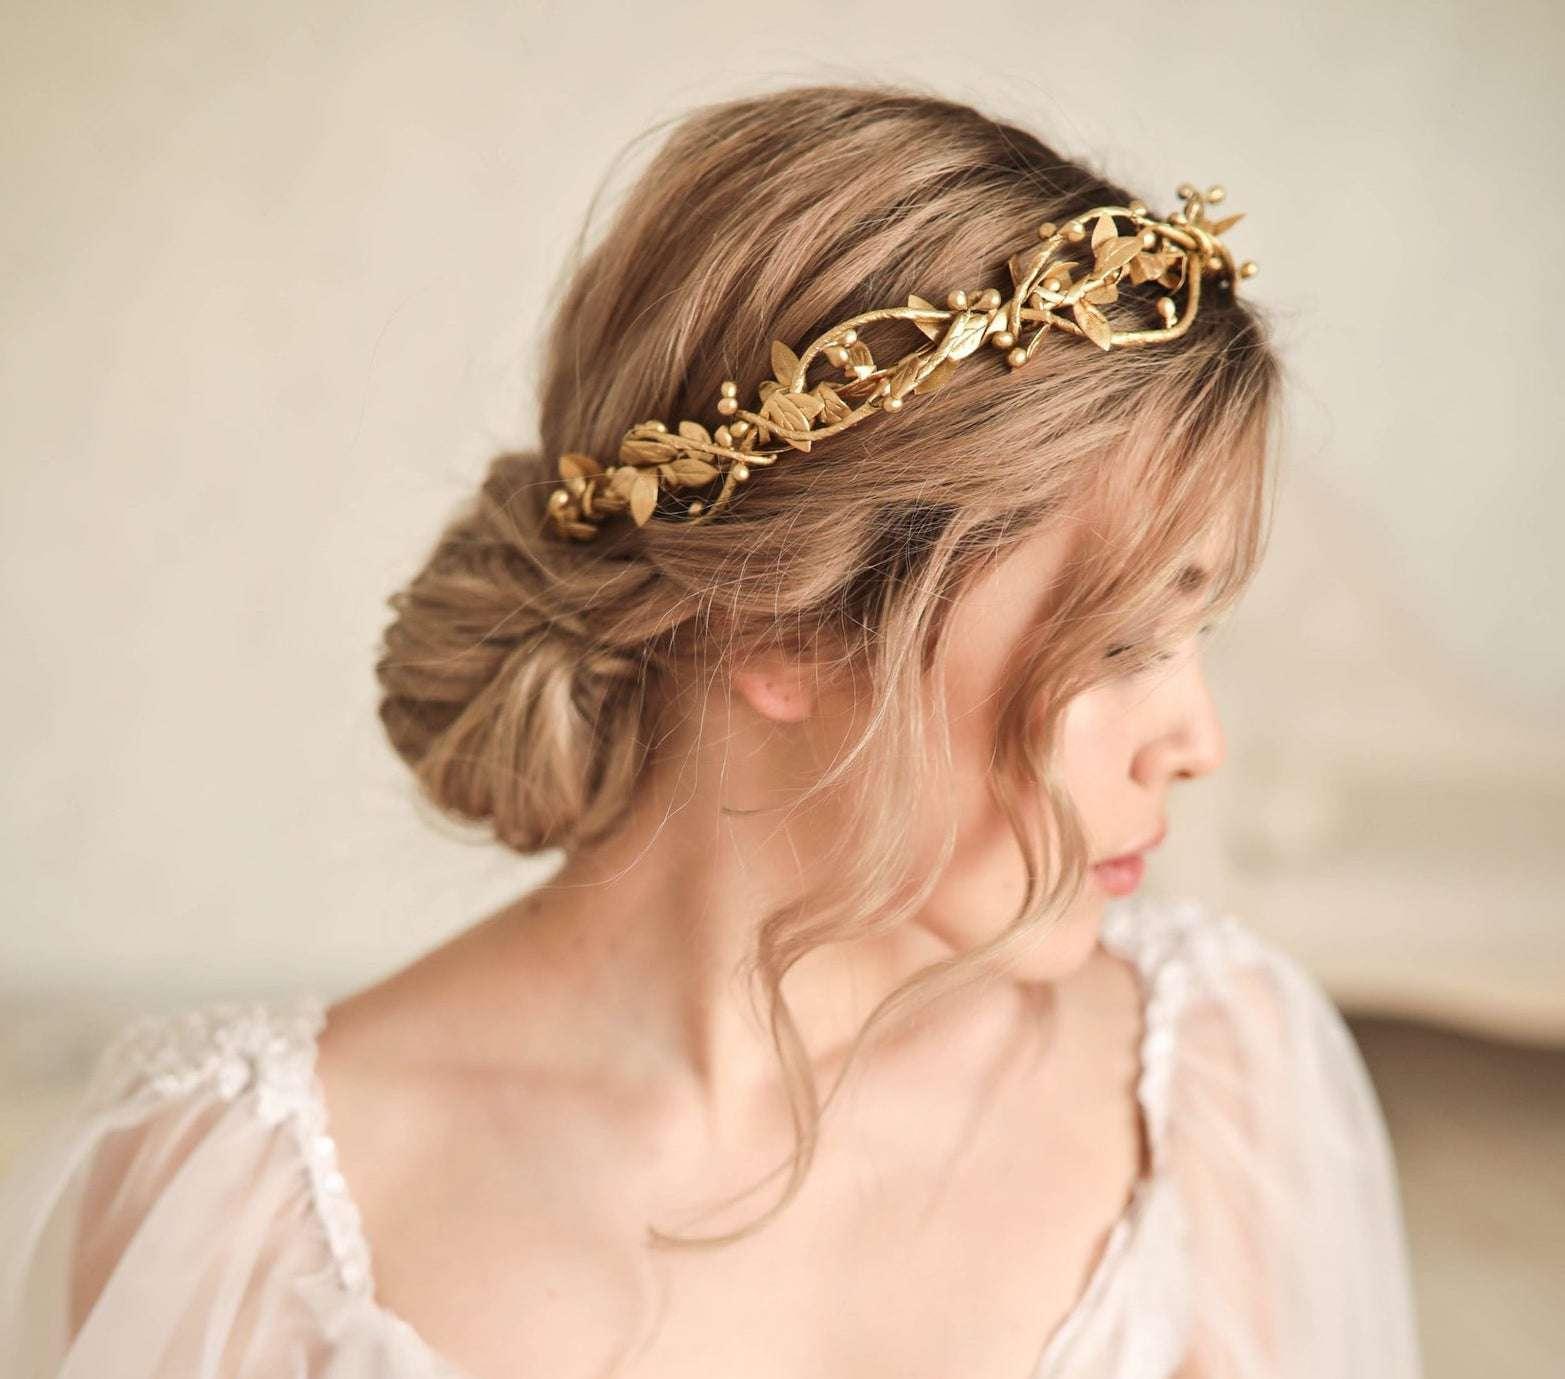 Large bridal comb Big golden crystal Hair Comb with pearls Bride tiara Princess Art Deco headpiece Tiara wedding hair comb